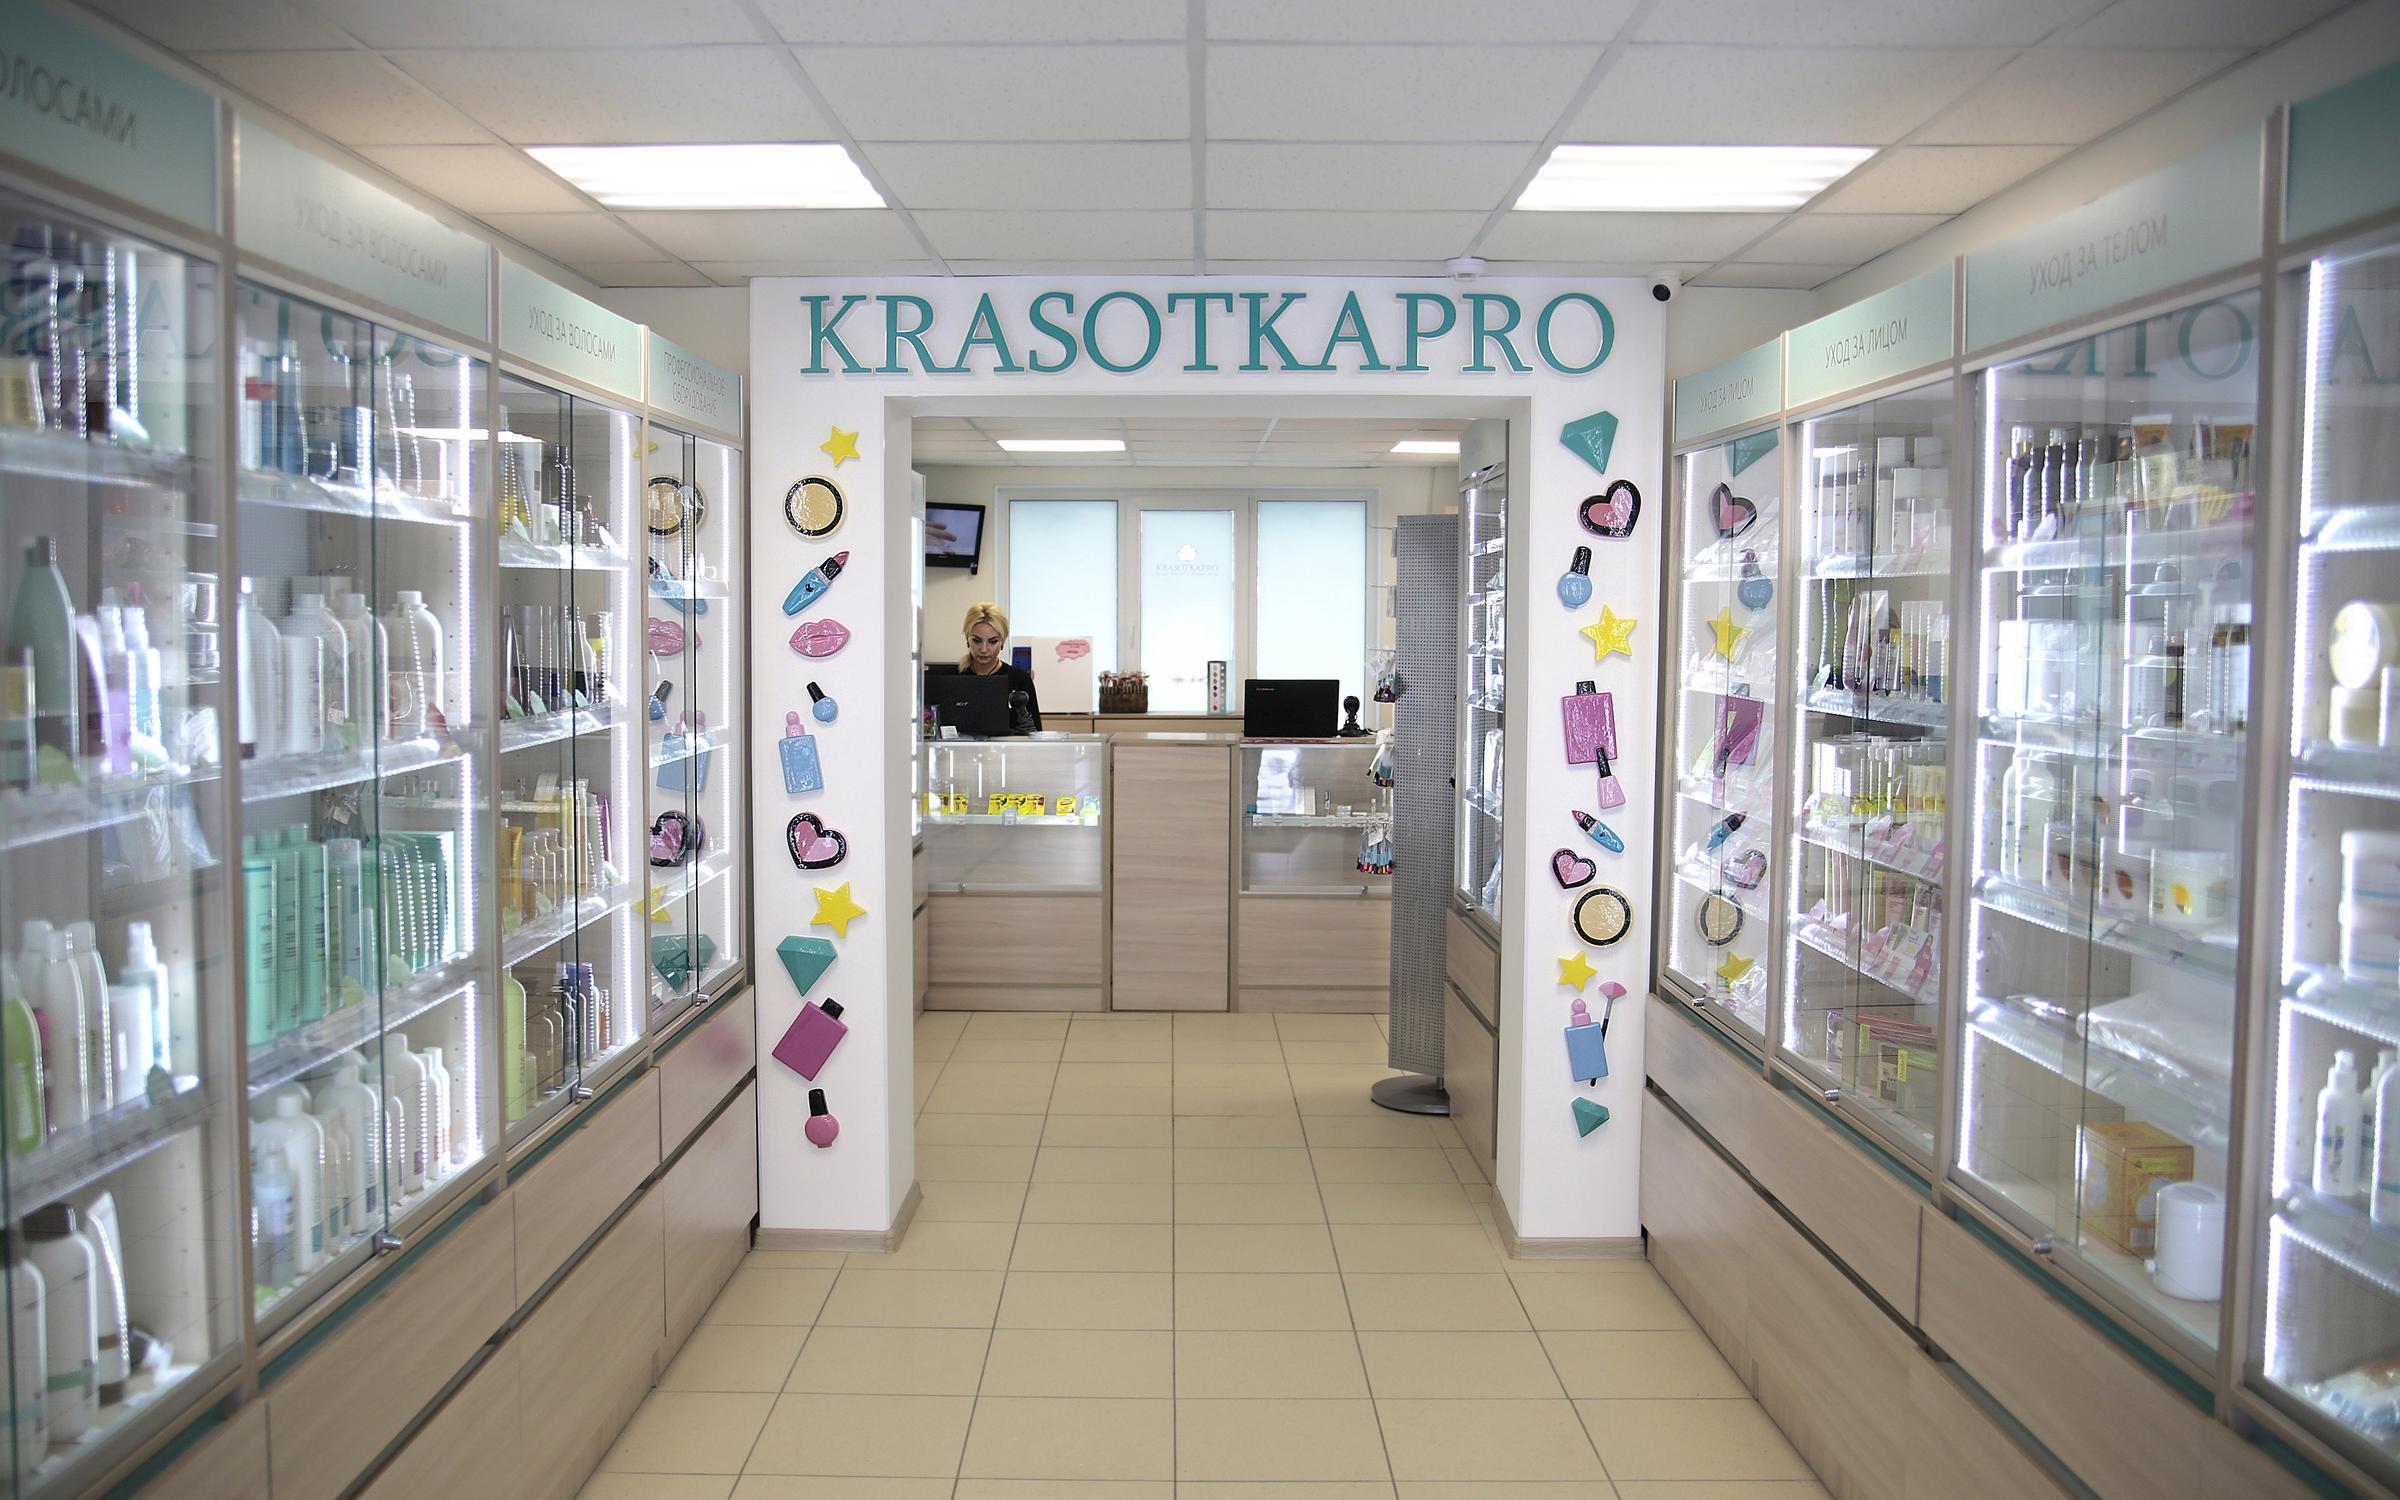 фотография Интернет-магазина косметики Krasotkapro.ru на метро Курская